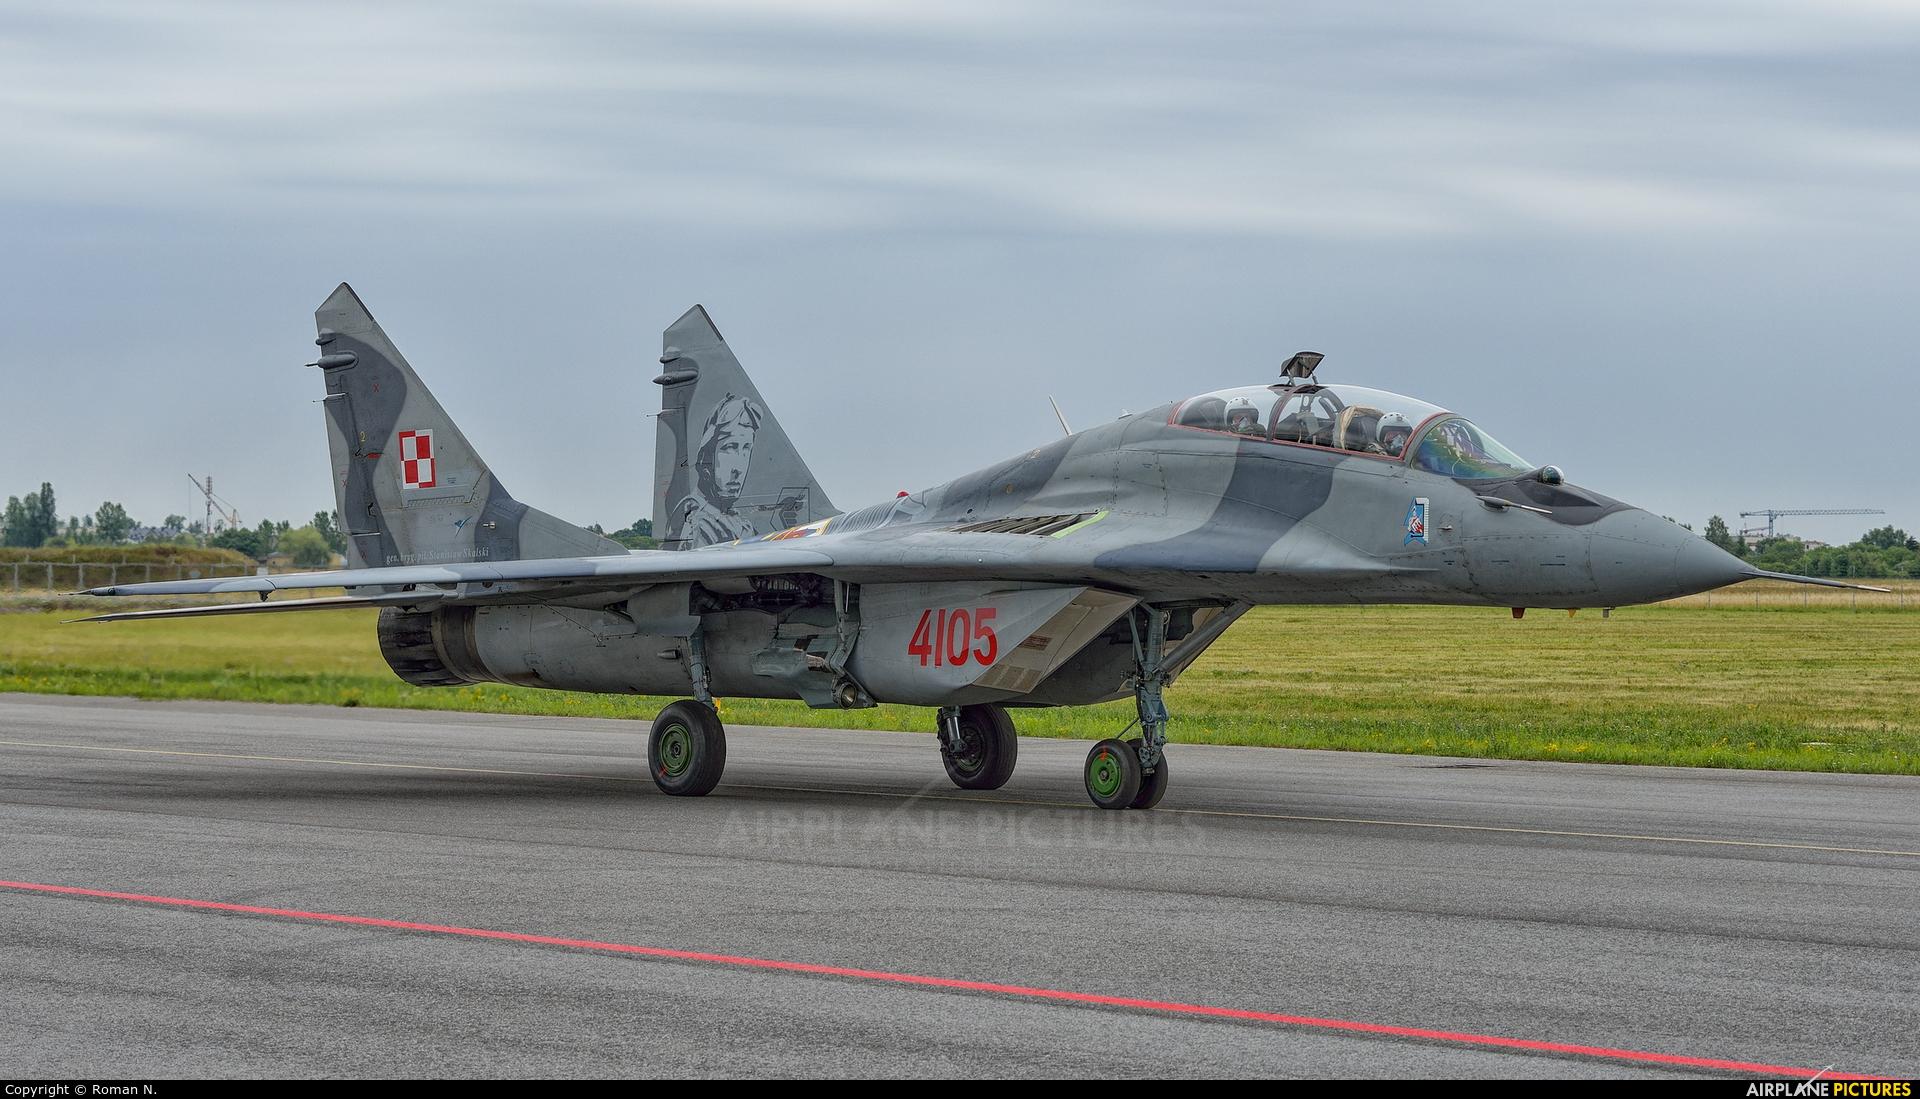 Poland - Air Force 4105 aircraft at Bydgoszcz - Szwederowo